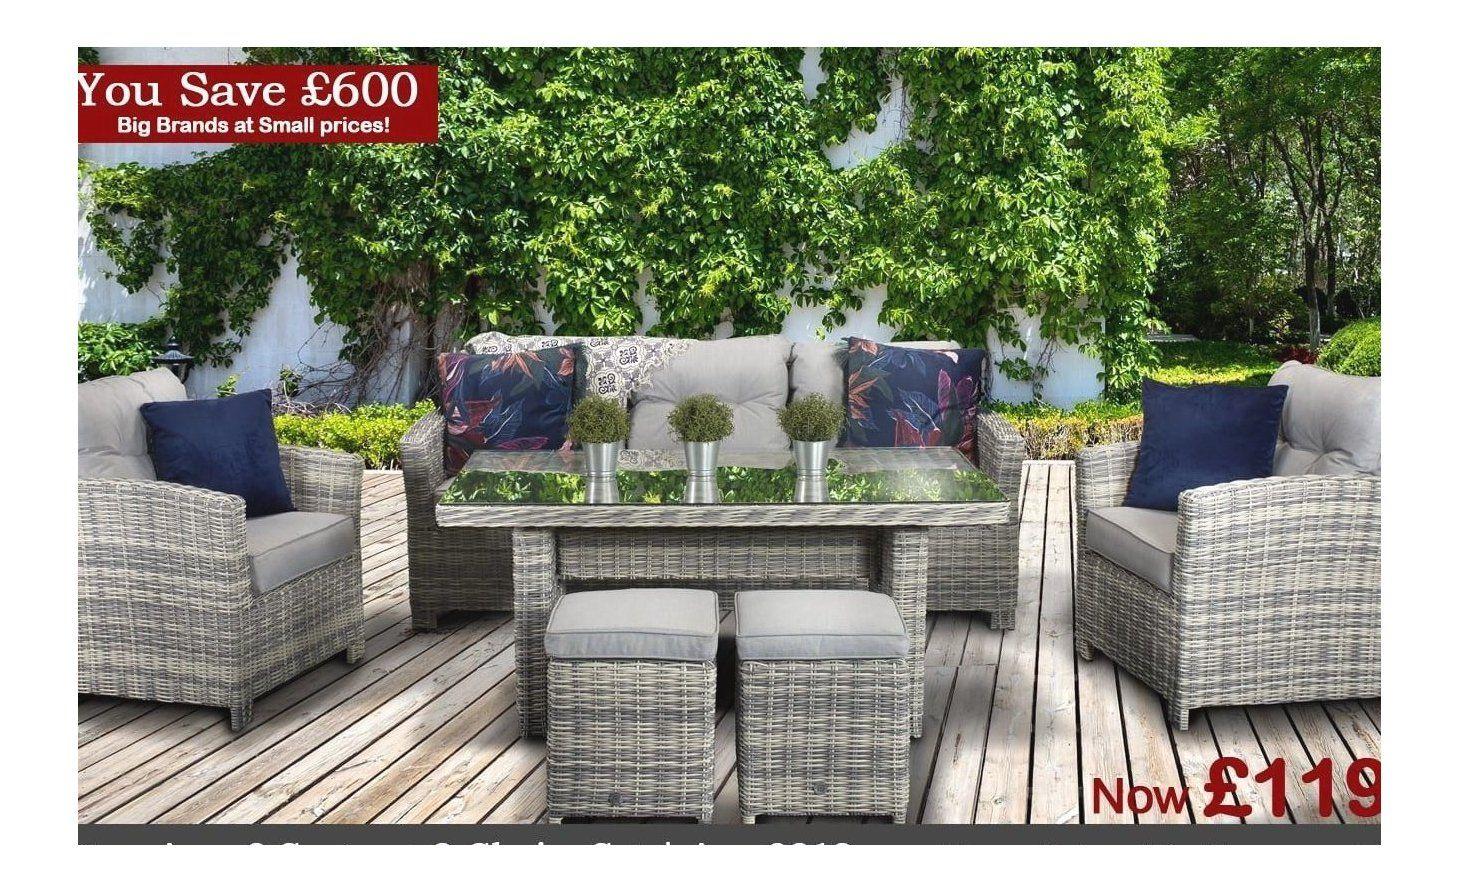 Homeflair Sale Now On Save Up To 70 Off Rattan From 249 1000 In 2020 Rattan Garden Furniture Garden Furniture Garden Sofa Set